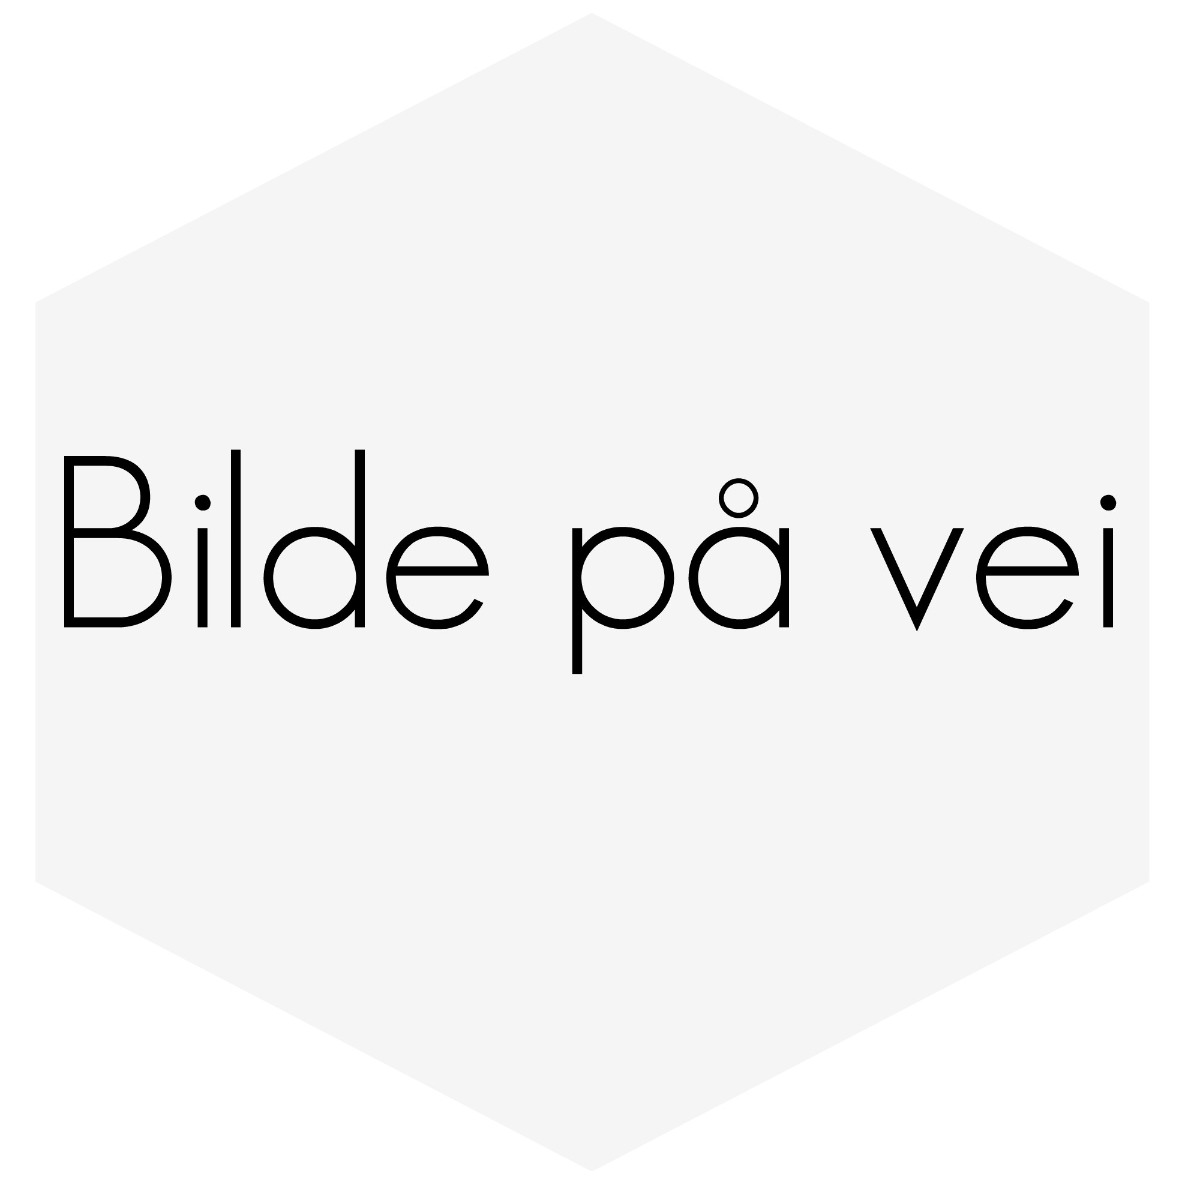 BAKLAMPE TIL VOLVO S80 VENSTRE ORIGINAL TYPE 98-06 9187922